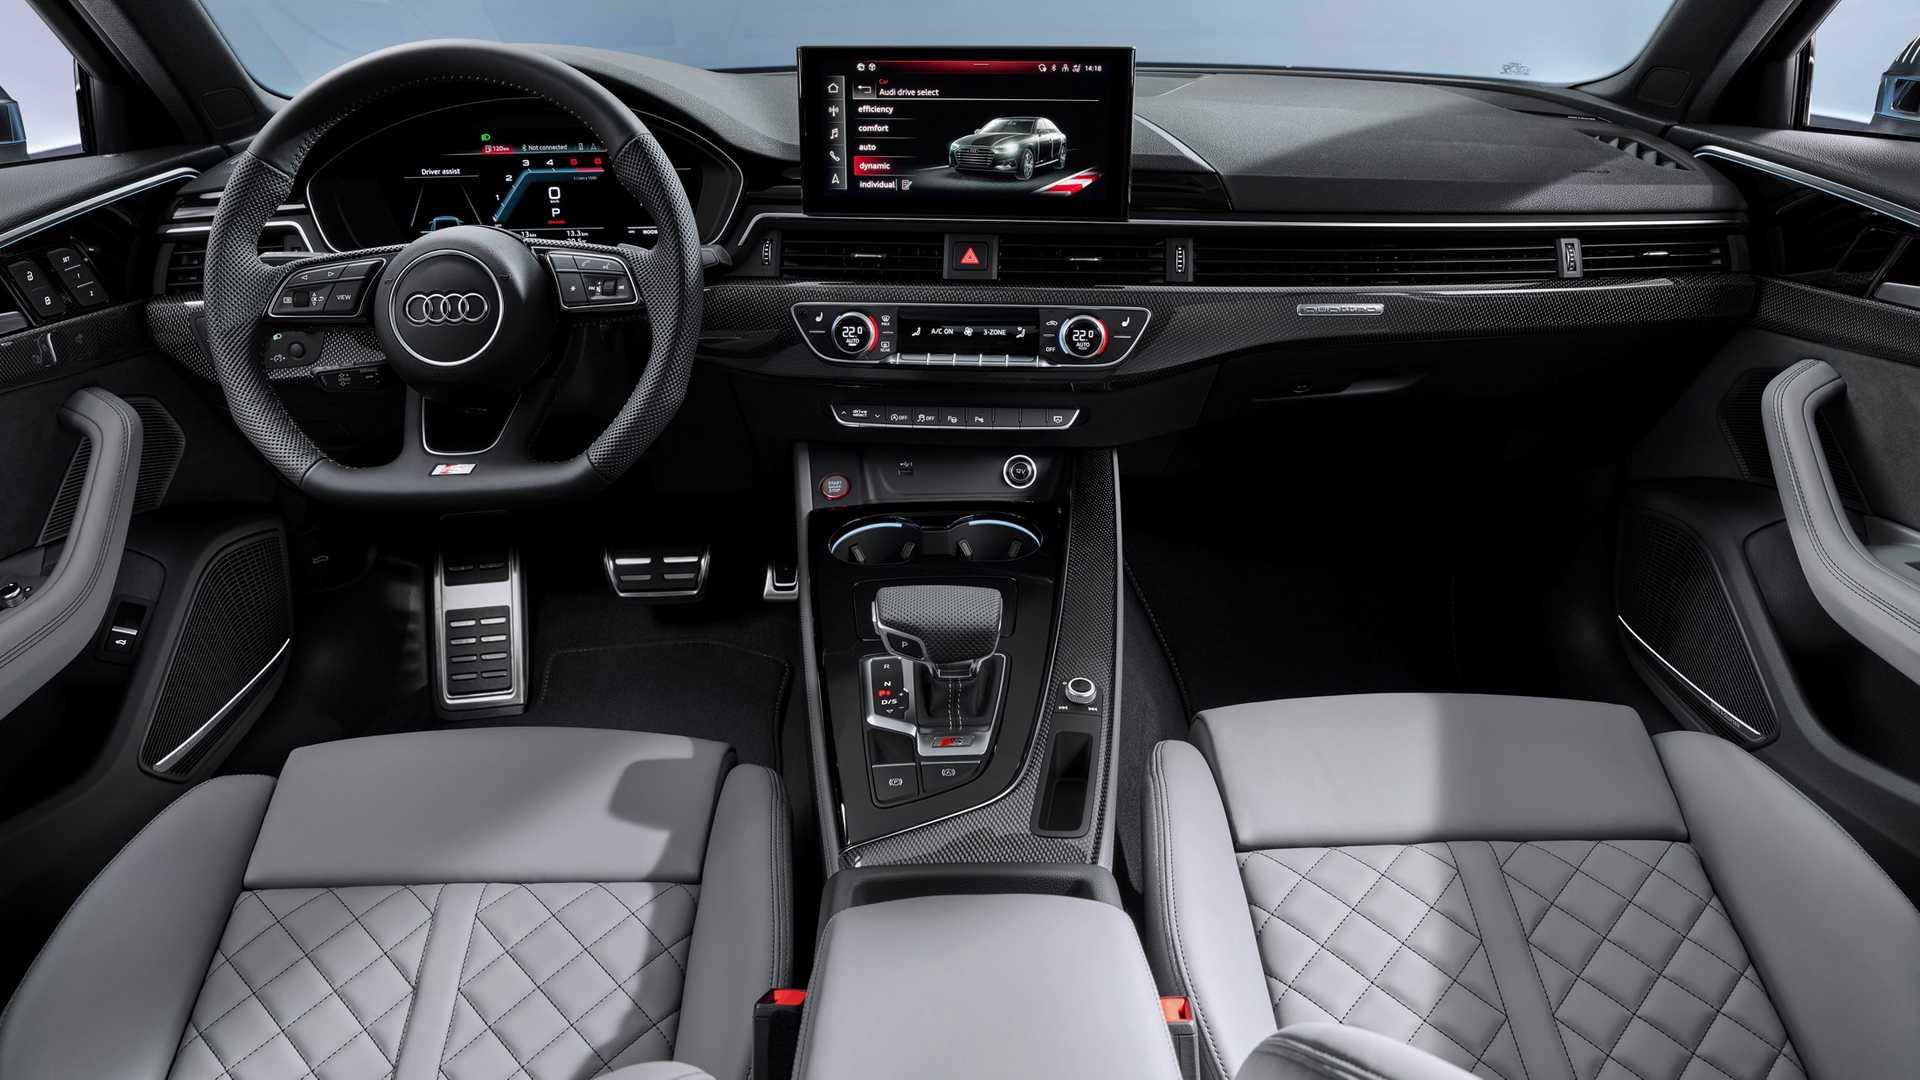 2020 Audi S4 TDI Interior Cockpit Wallpapers (6)